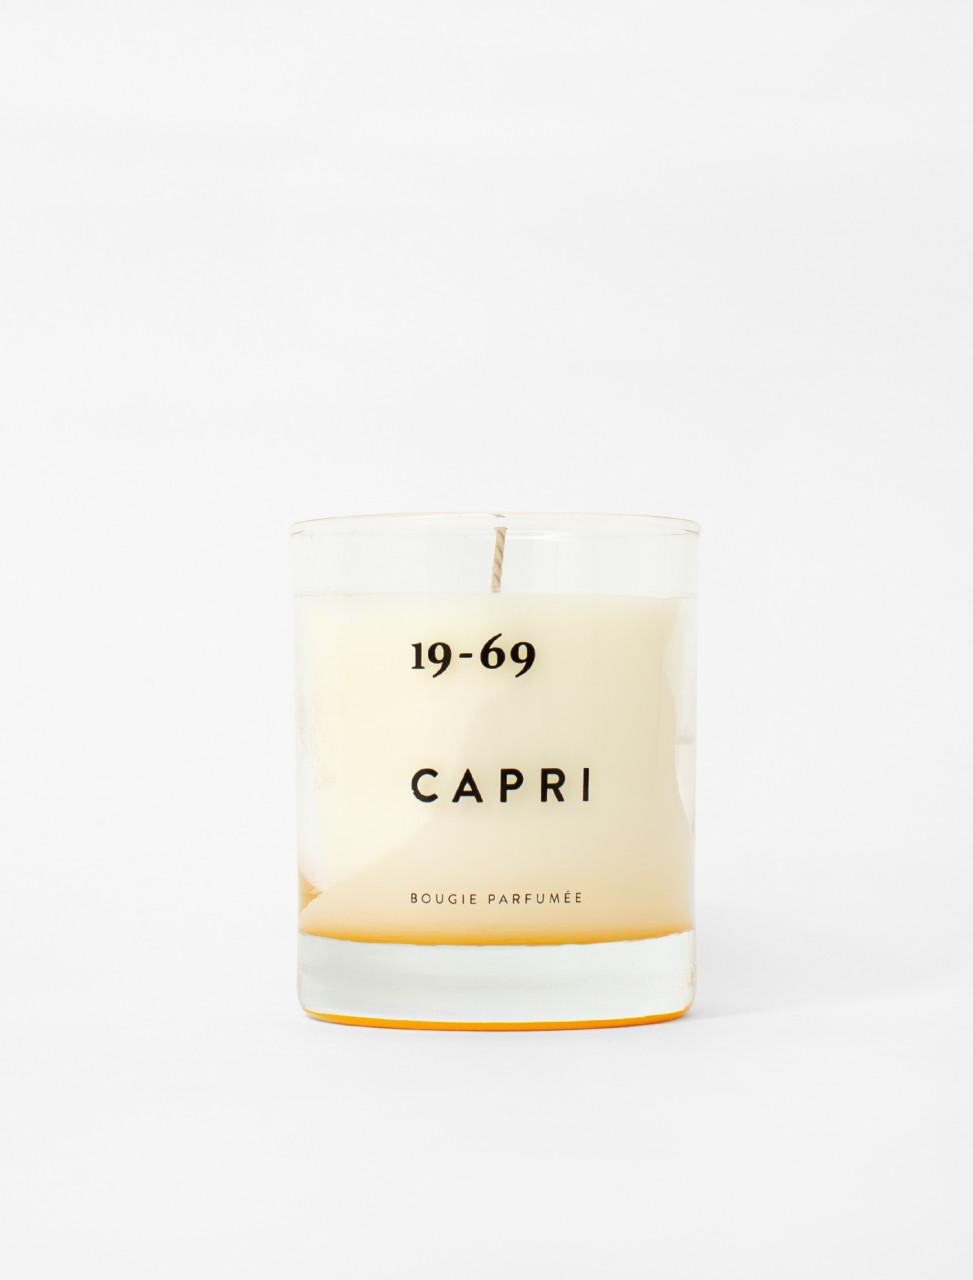 CAPRI Bougie Parfumée 200 ml